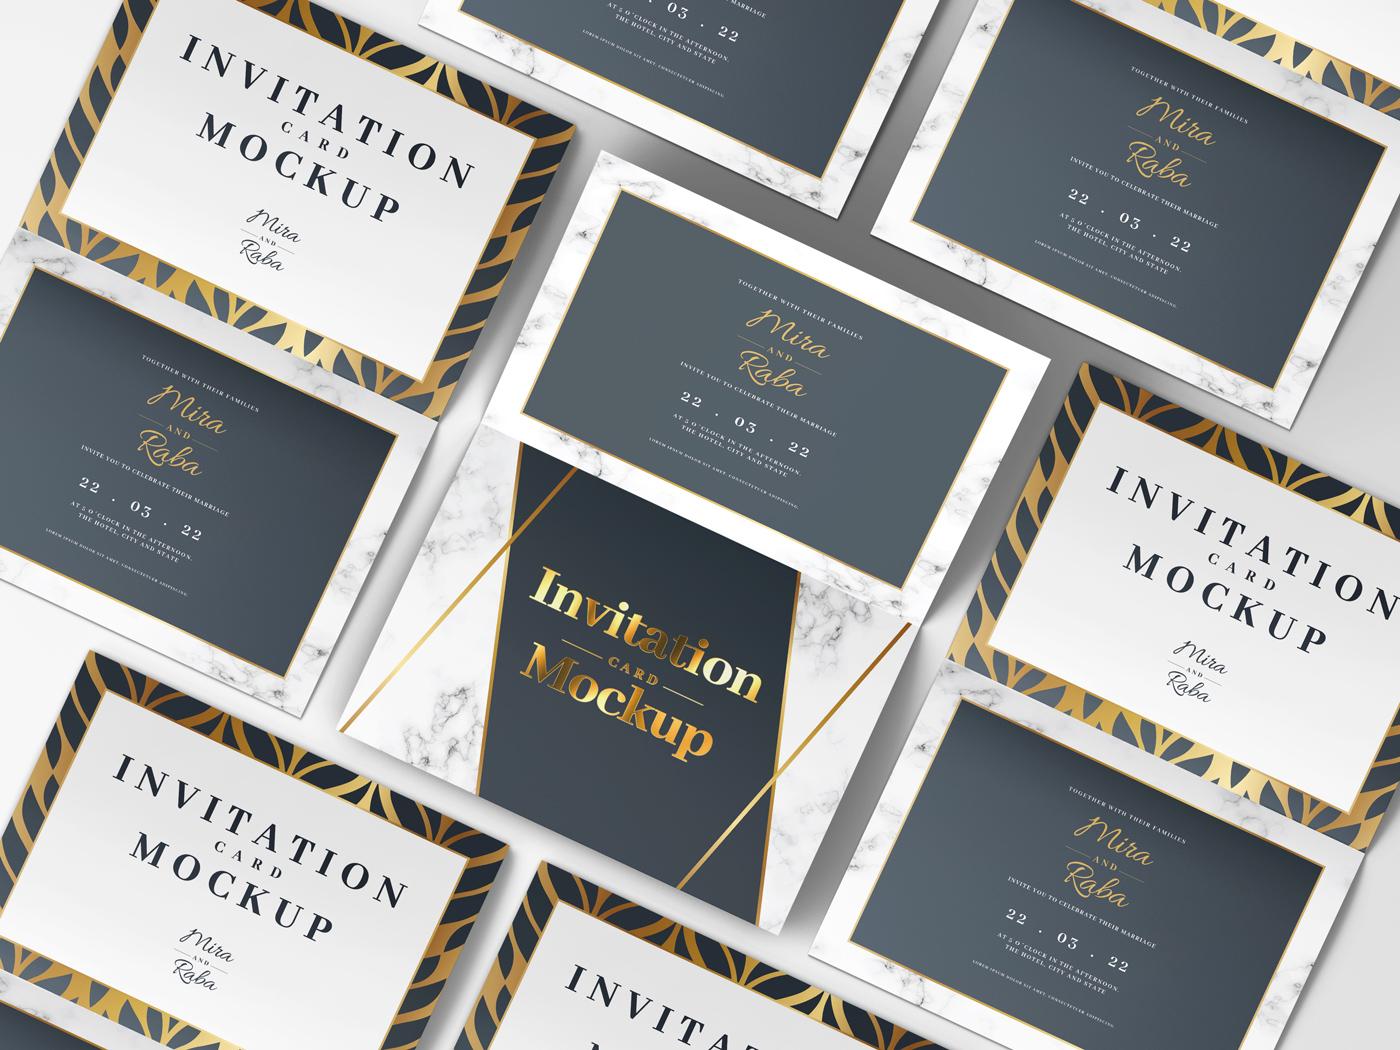 Invitation Card Mockups V1 example image 11